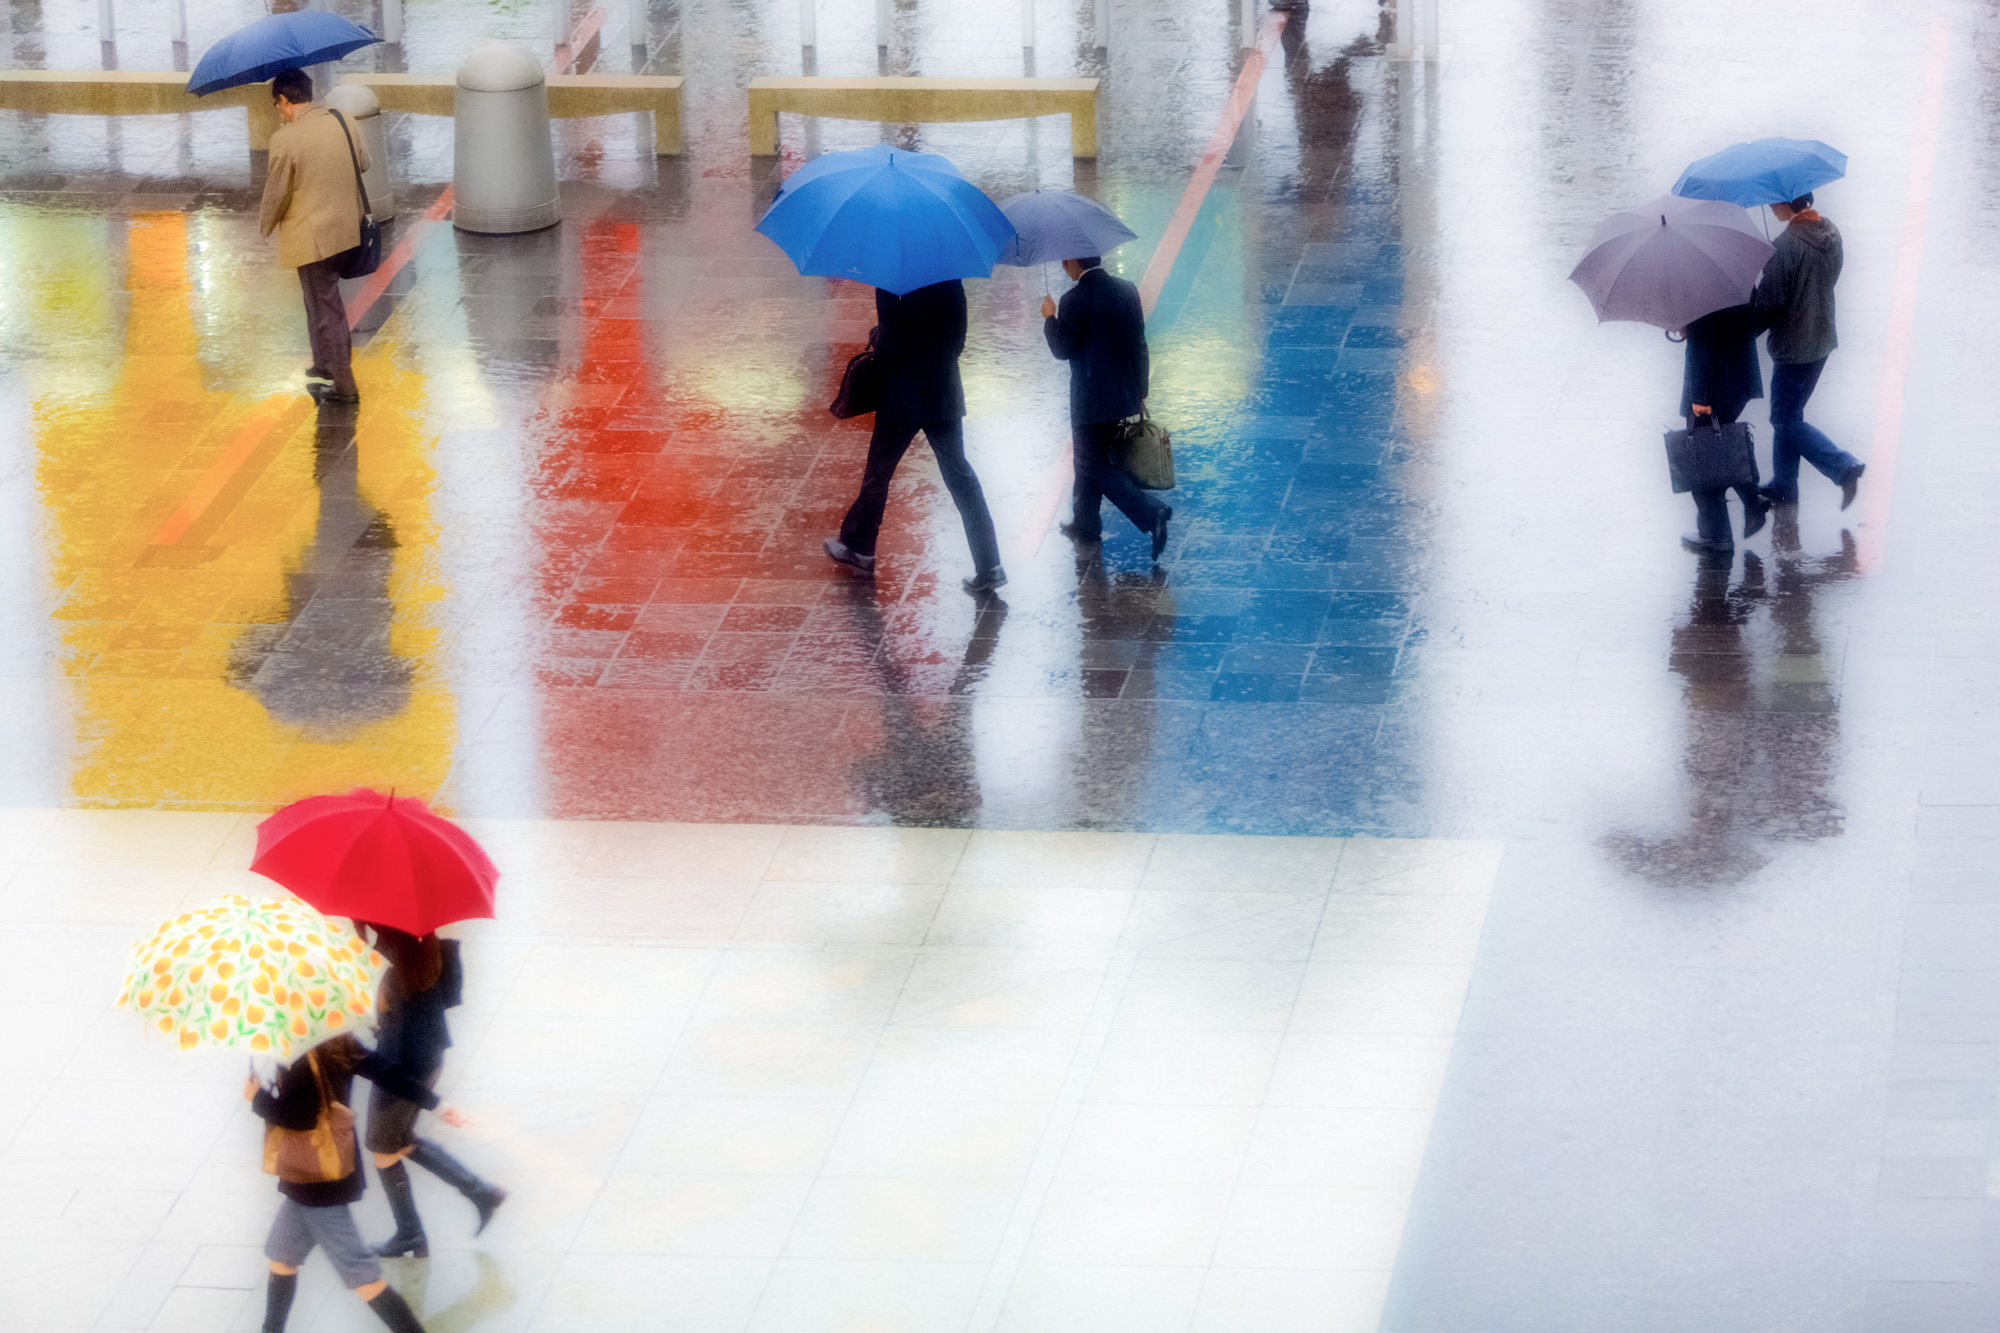 Rain_0172.jpg